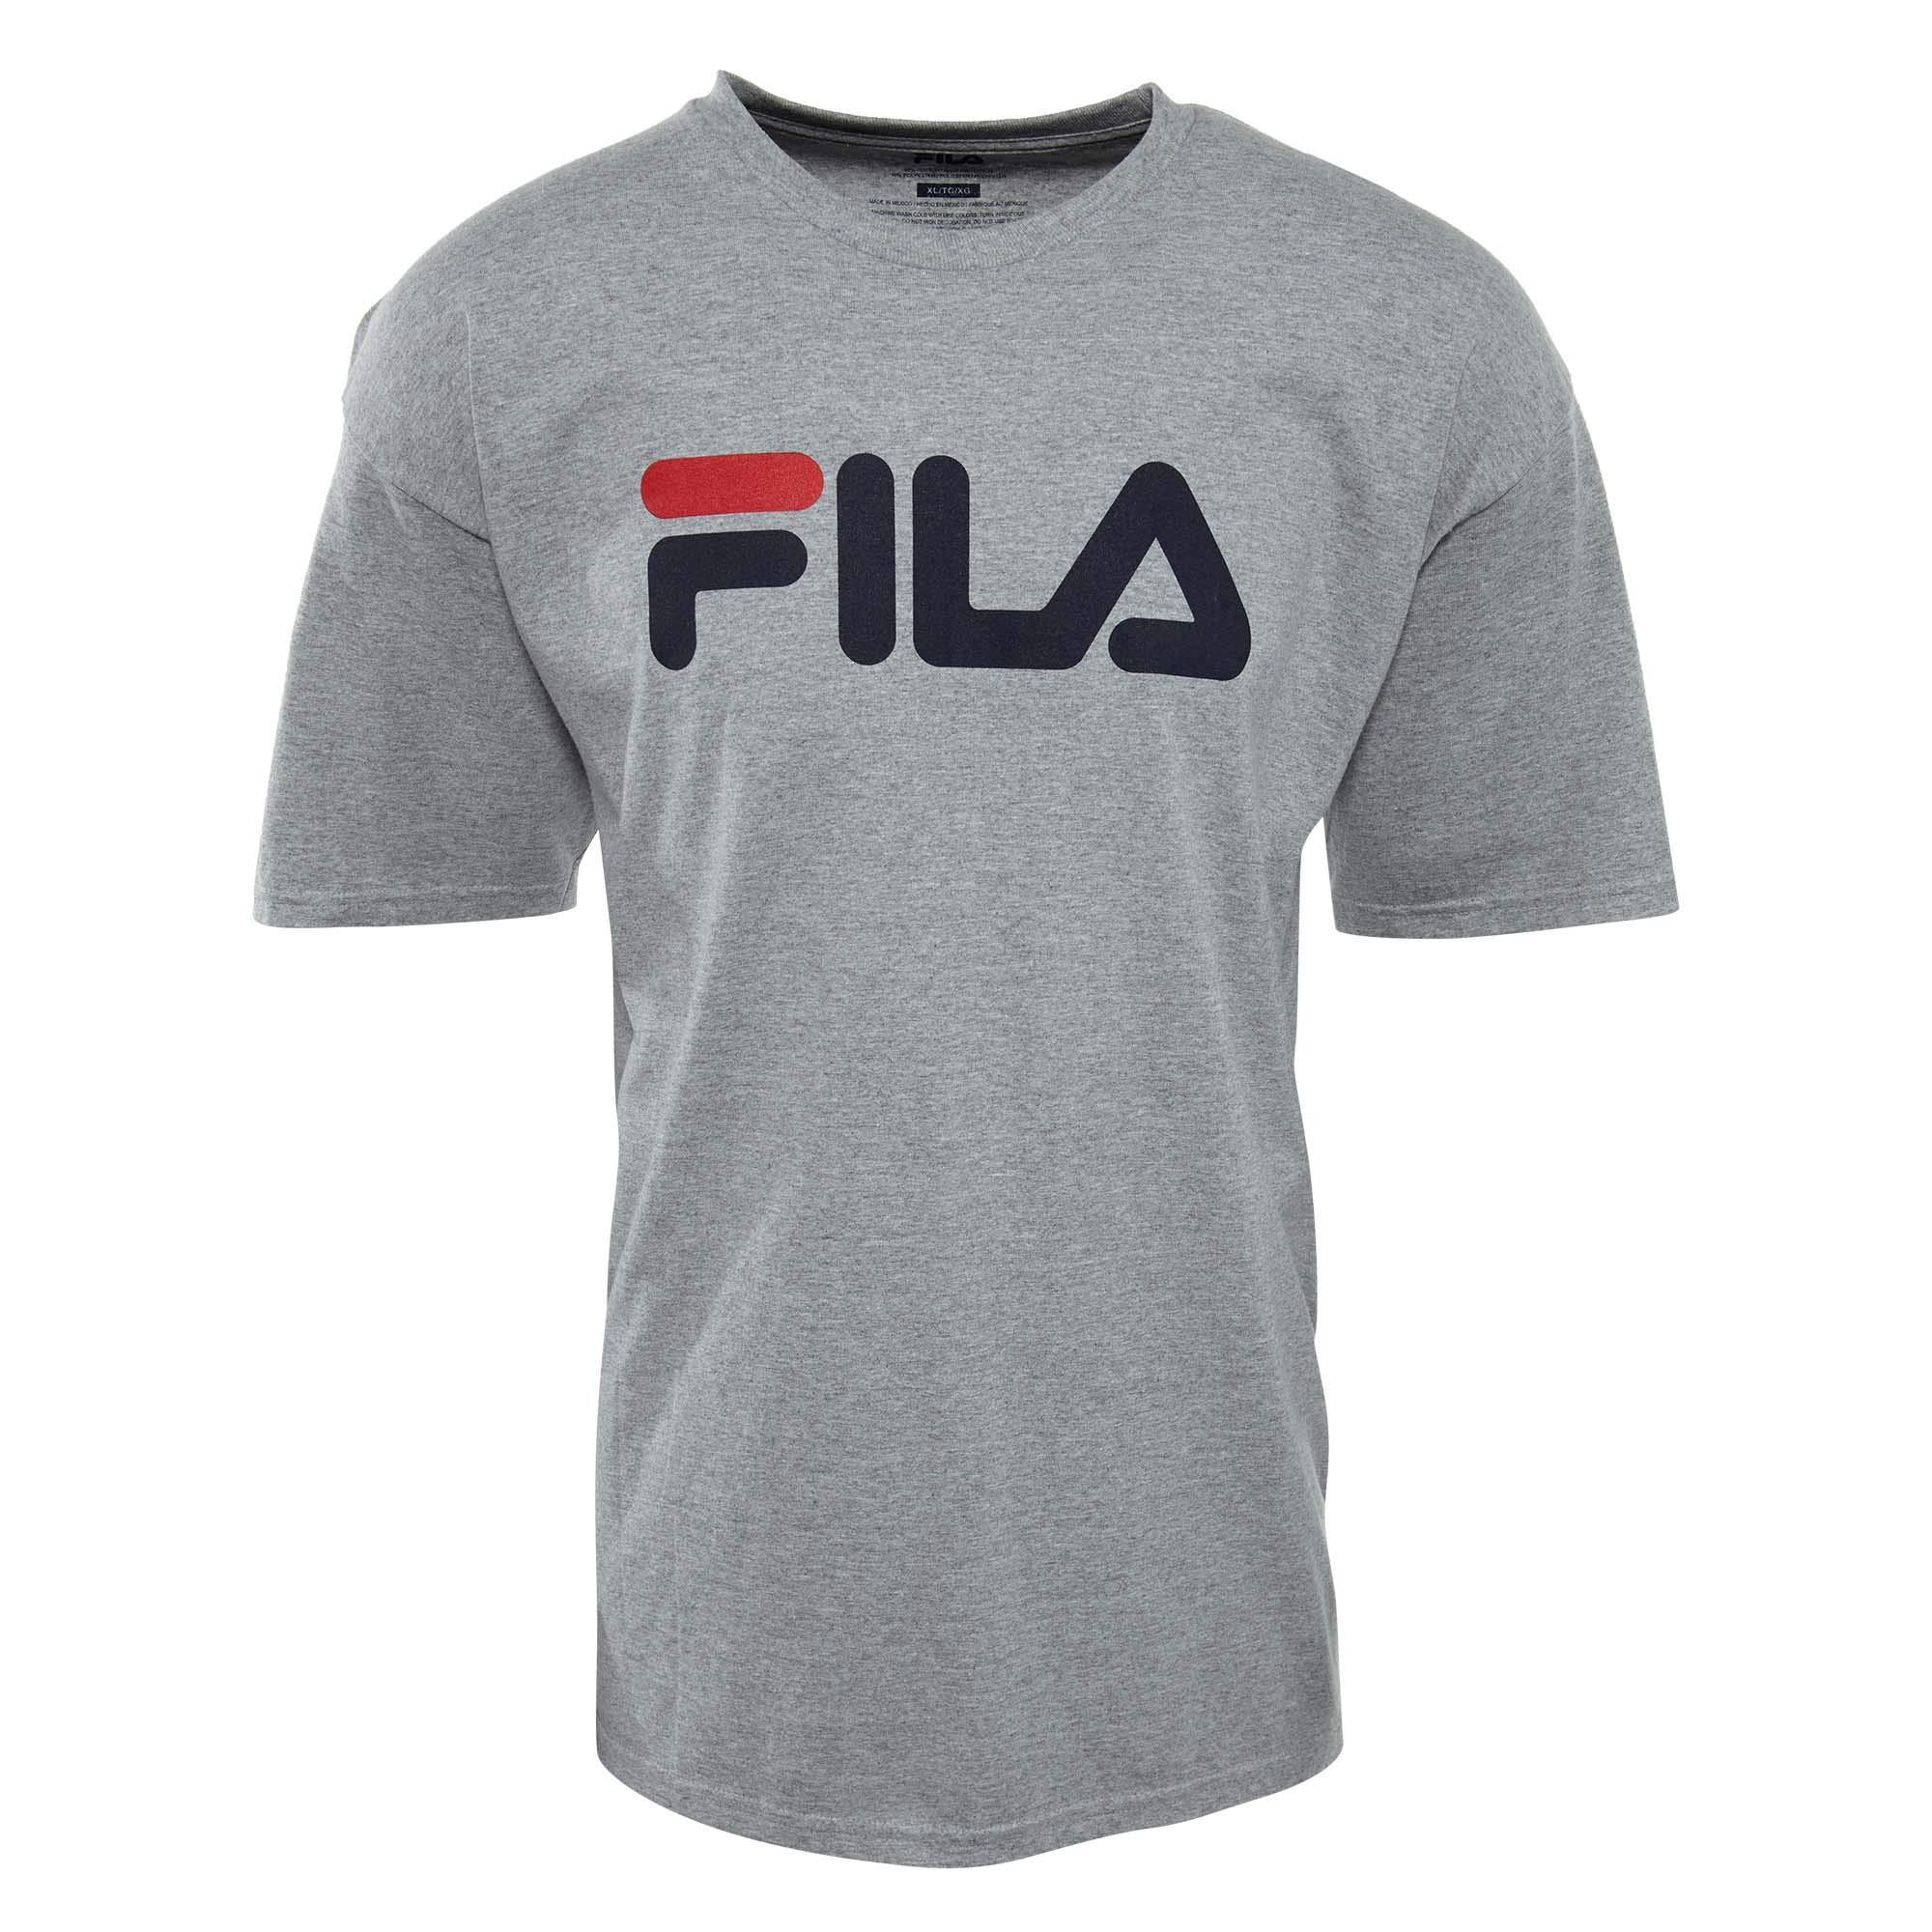 Fila Men's Logo Tee, Grey Heather, Small